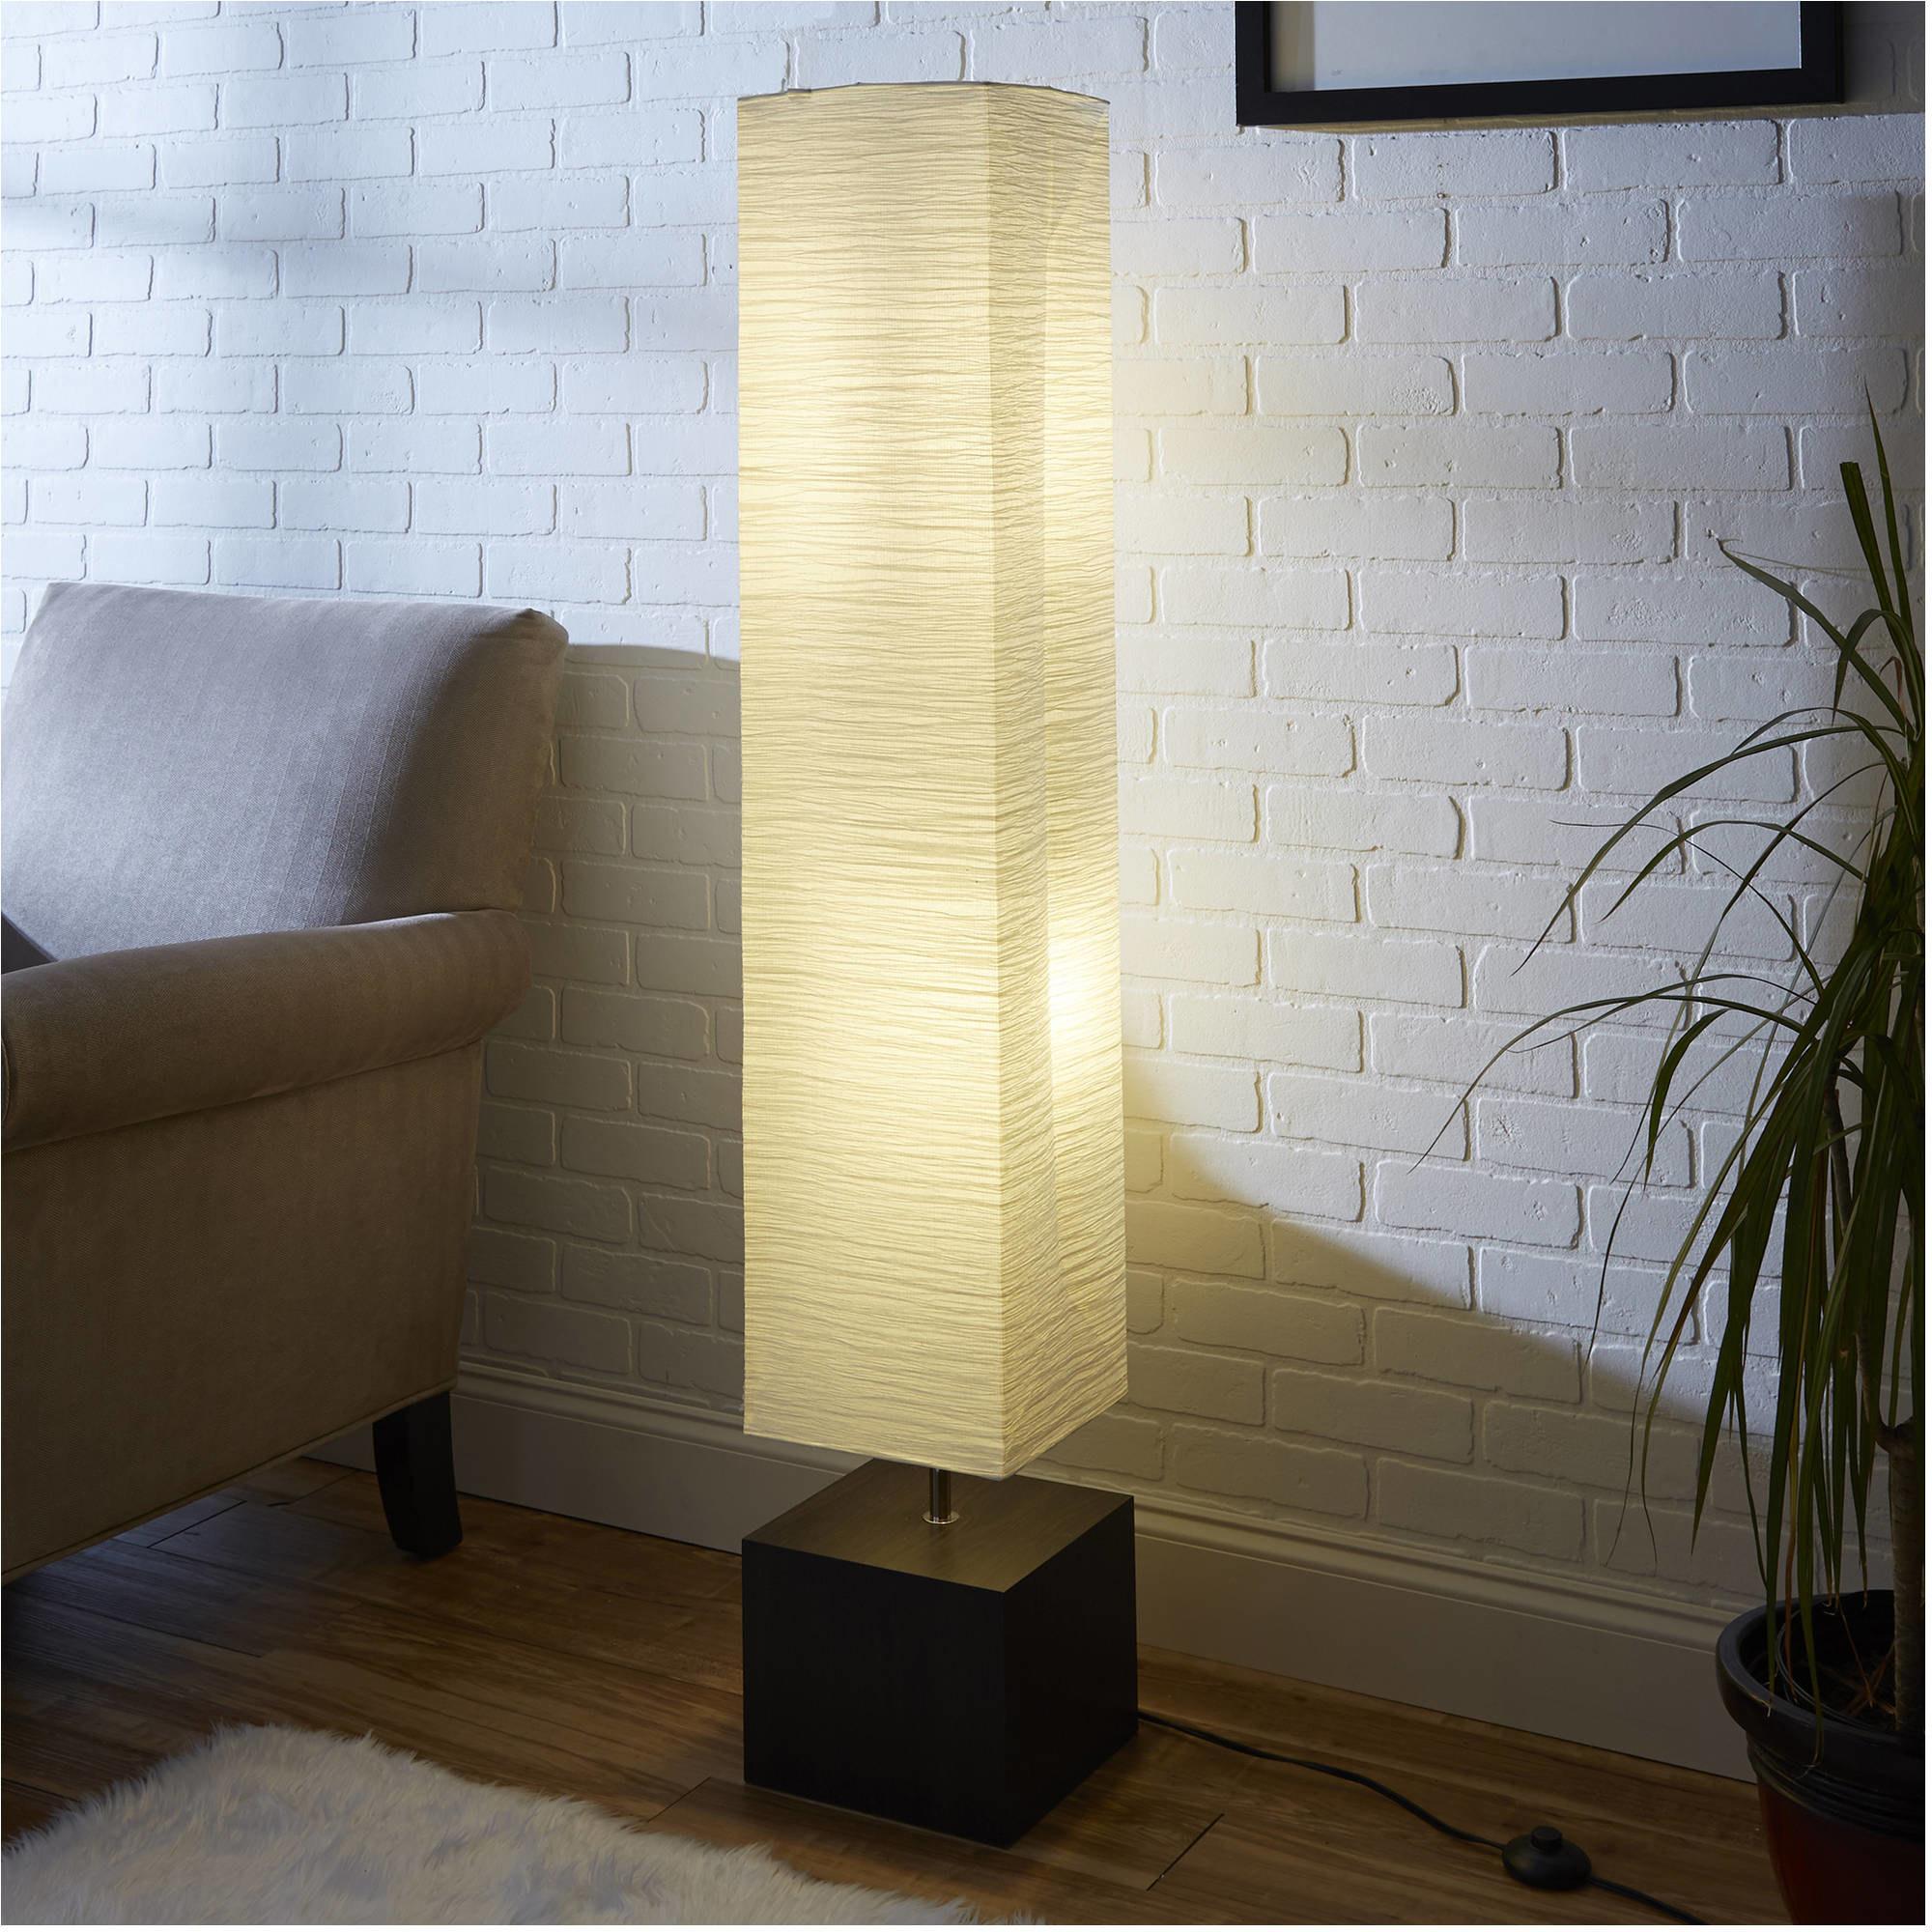 The floor lamp